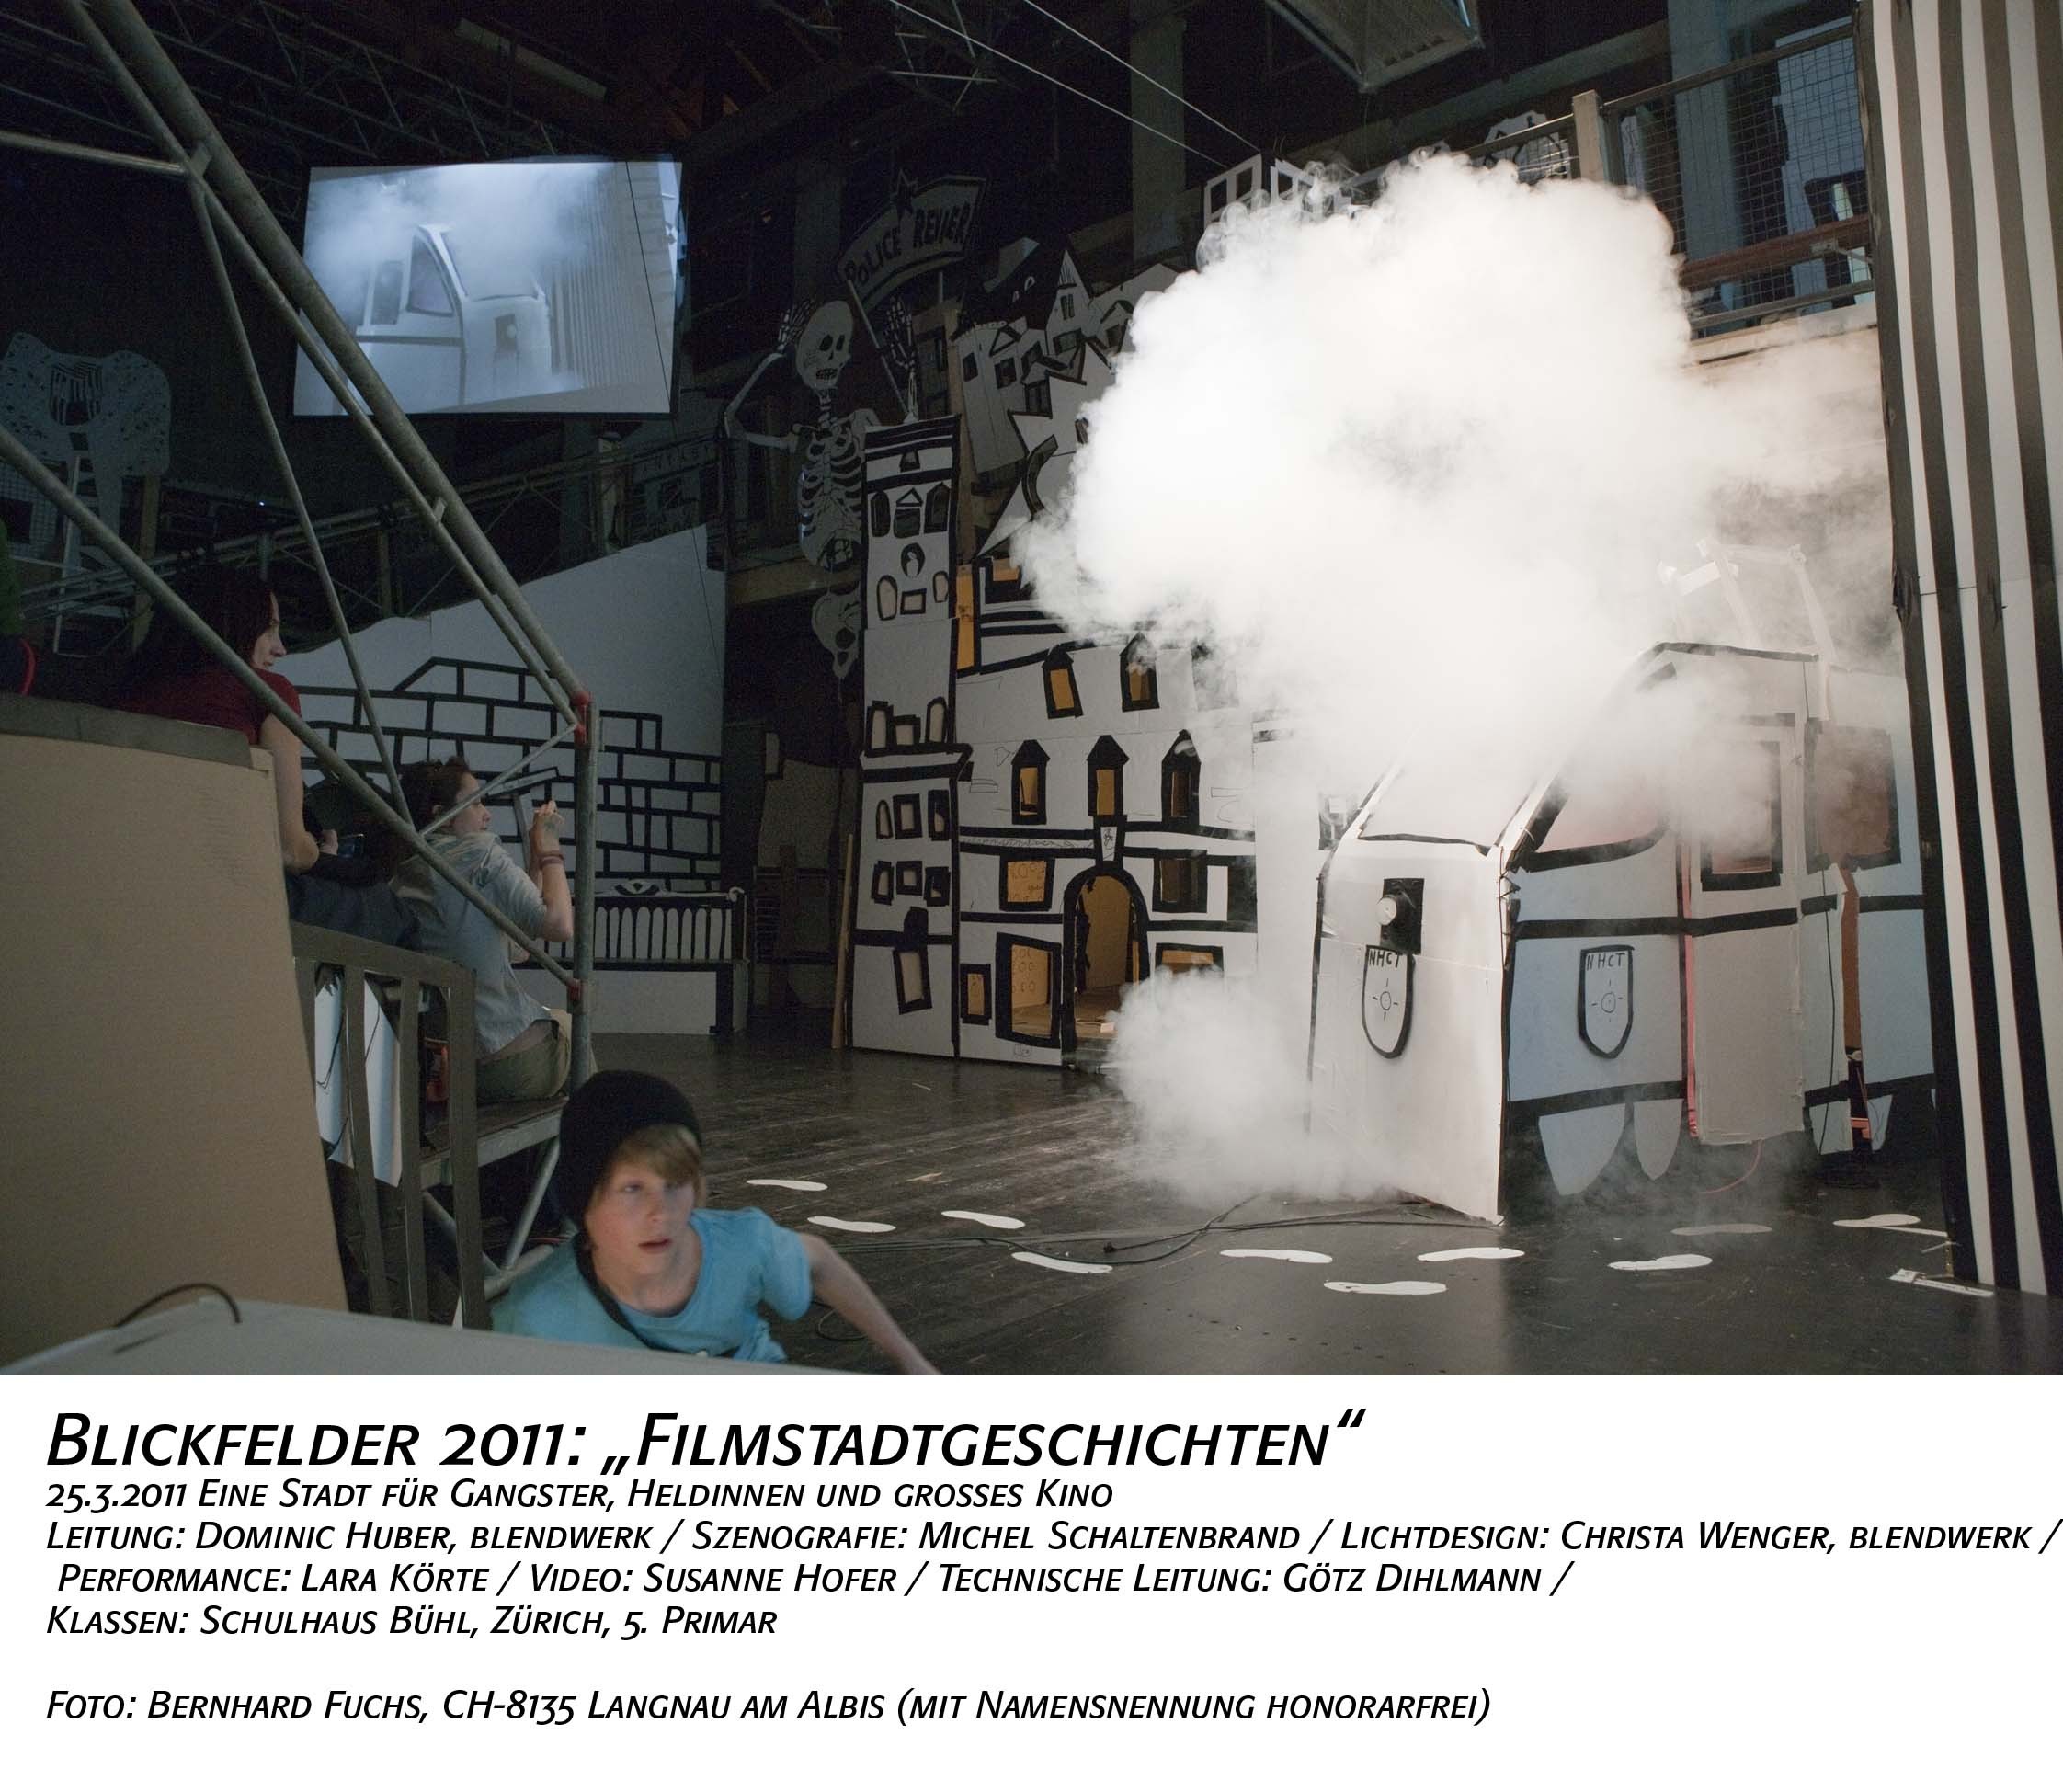 Filmstadtgeschichten-03.jpg